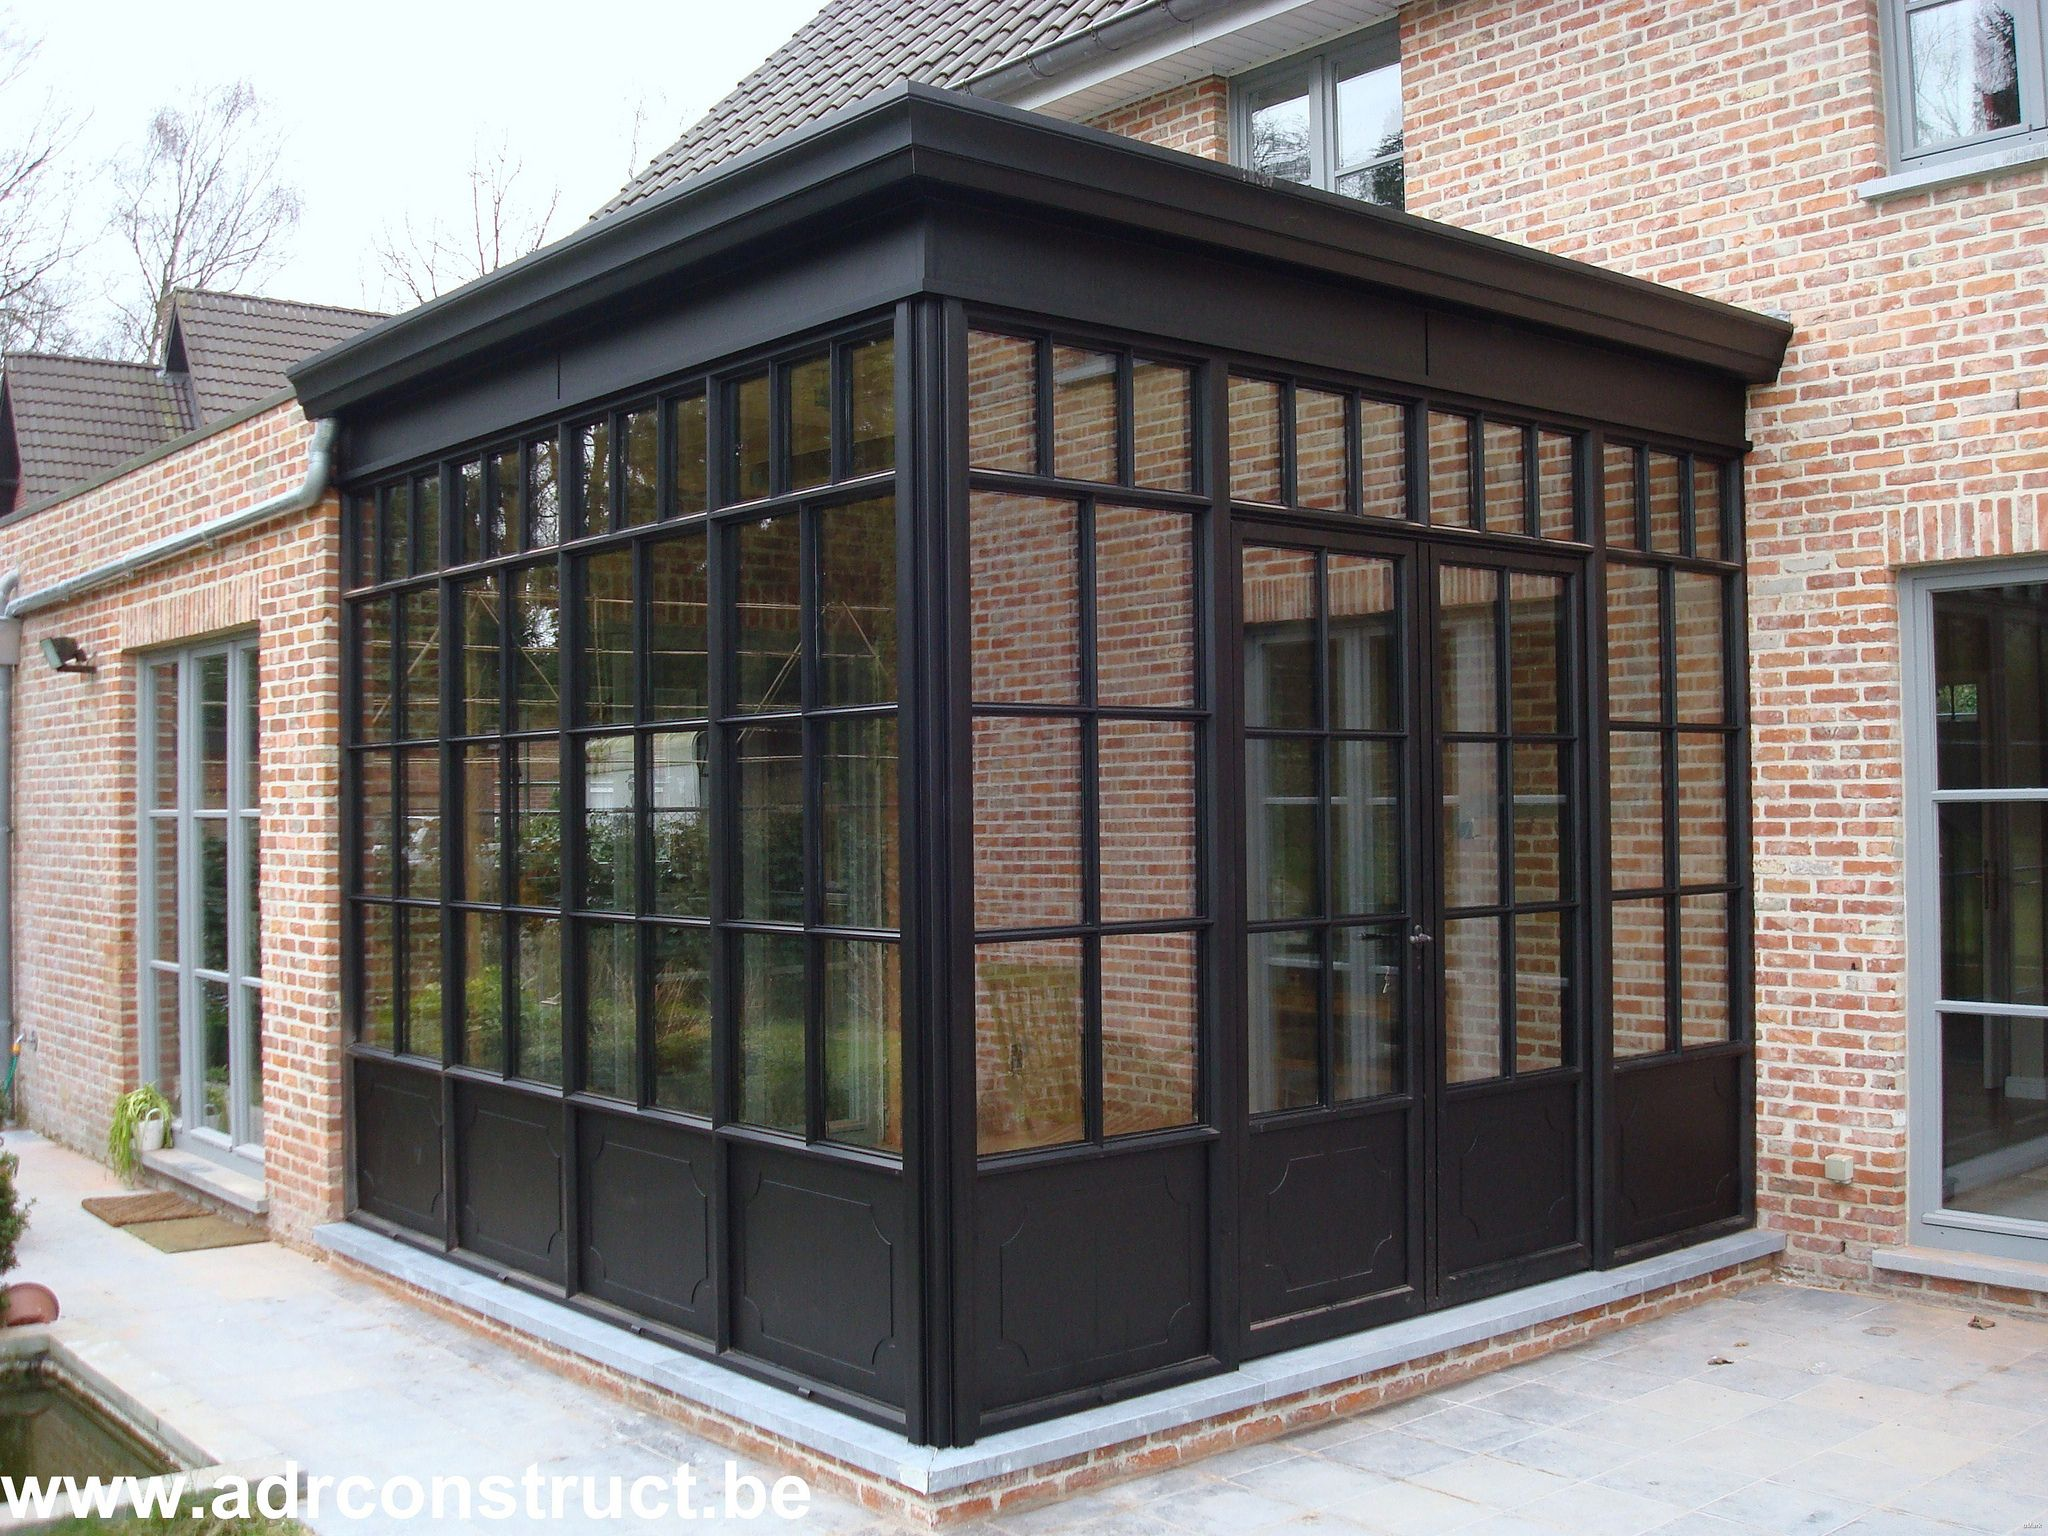 Steel Look Veranda Glass Porch House Exterior Architecture